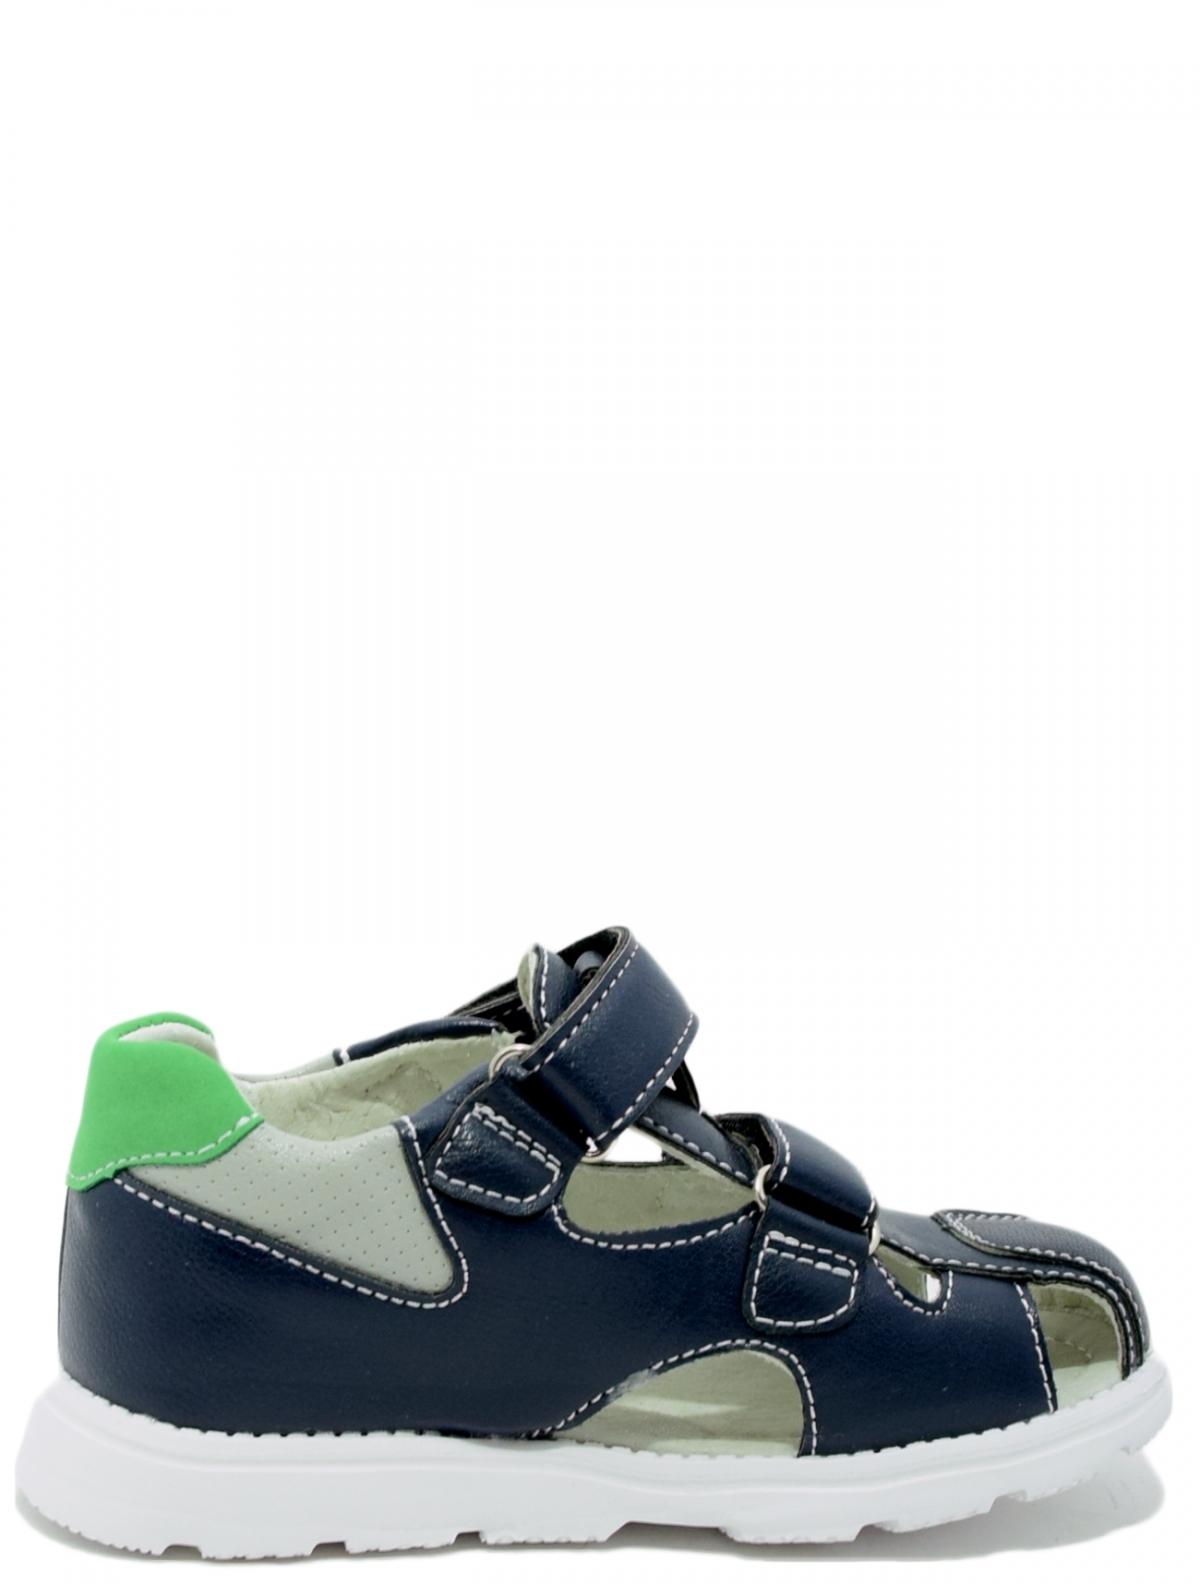 BERTEN B2397 детские сандали